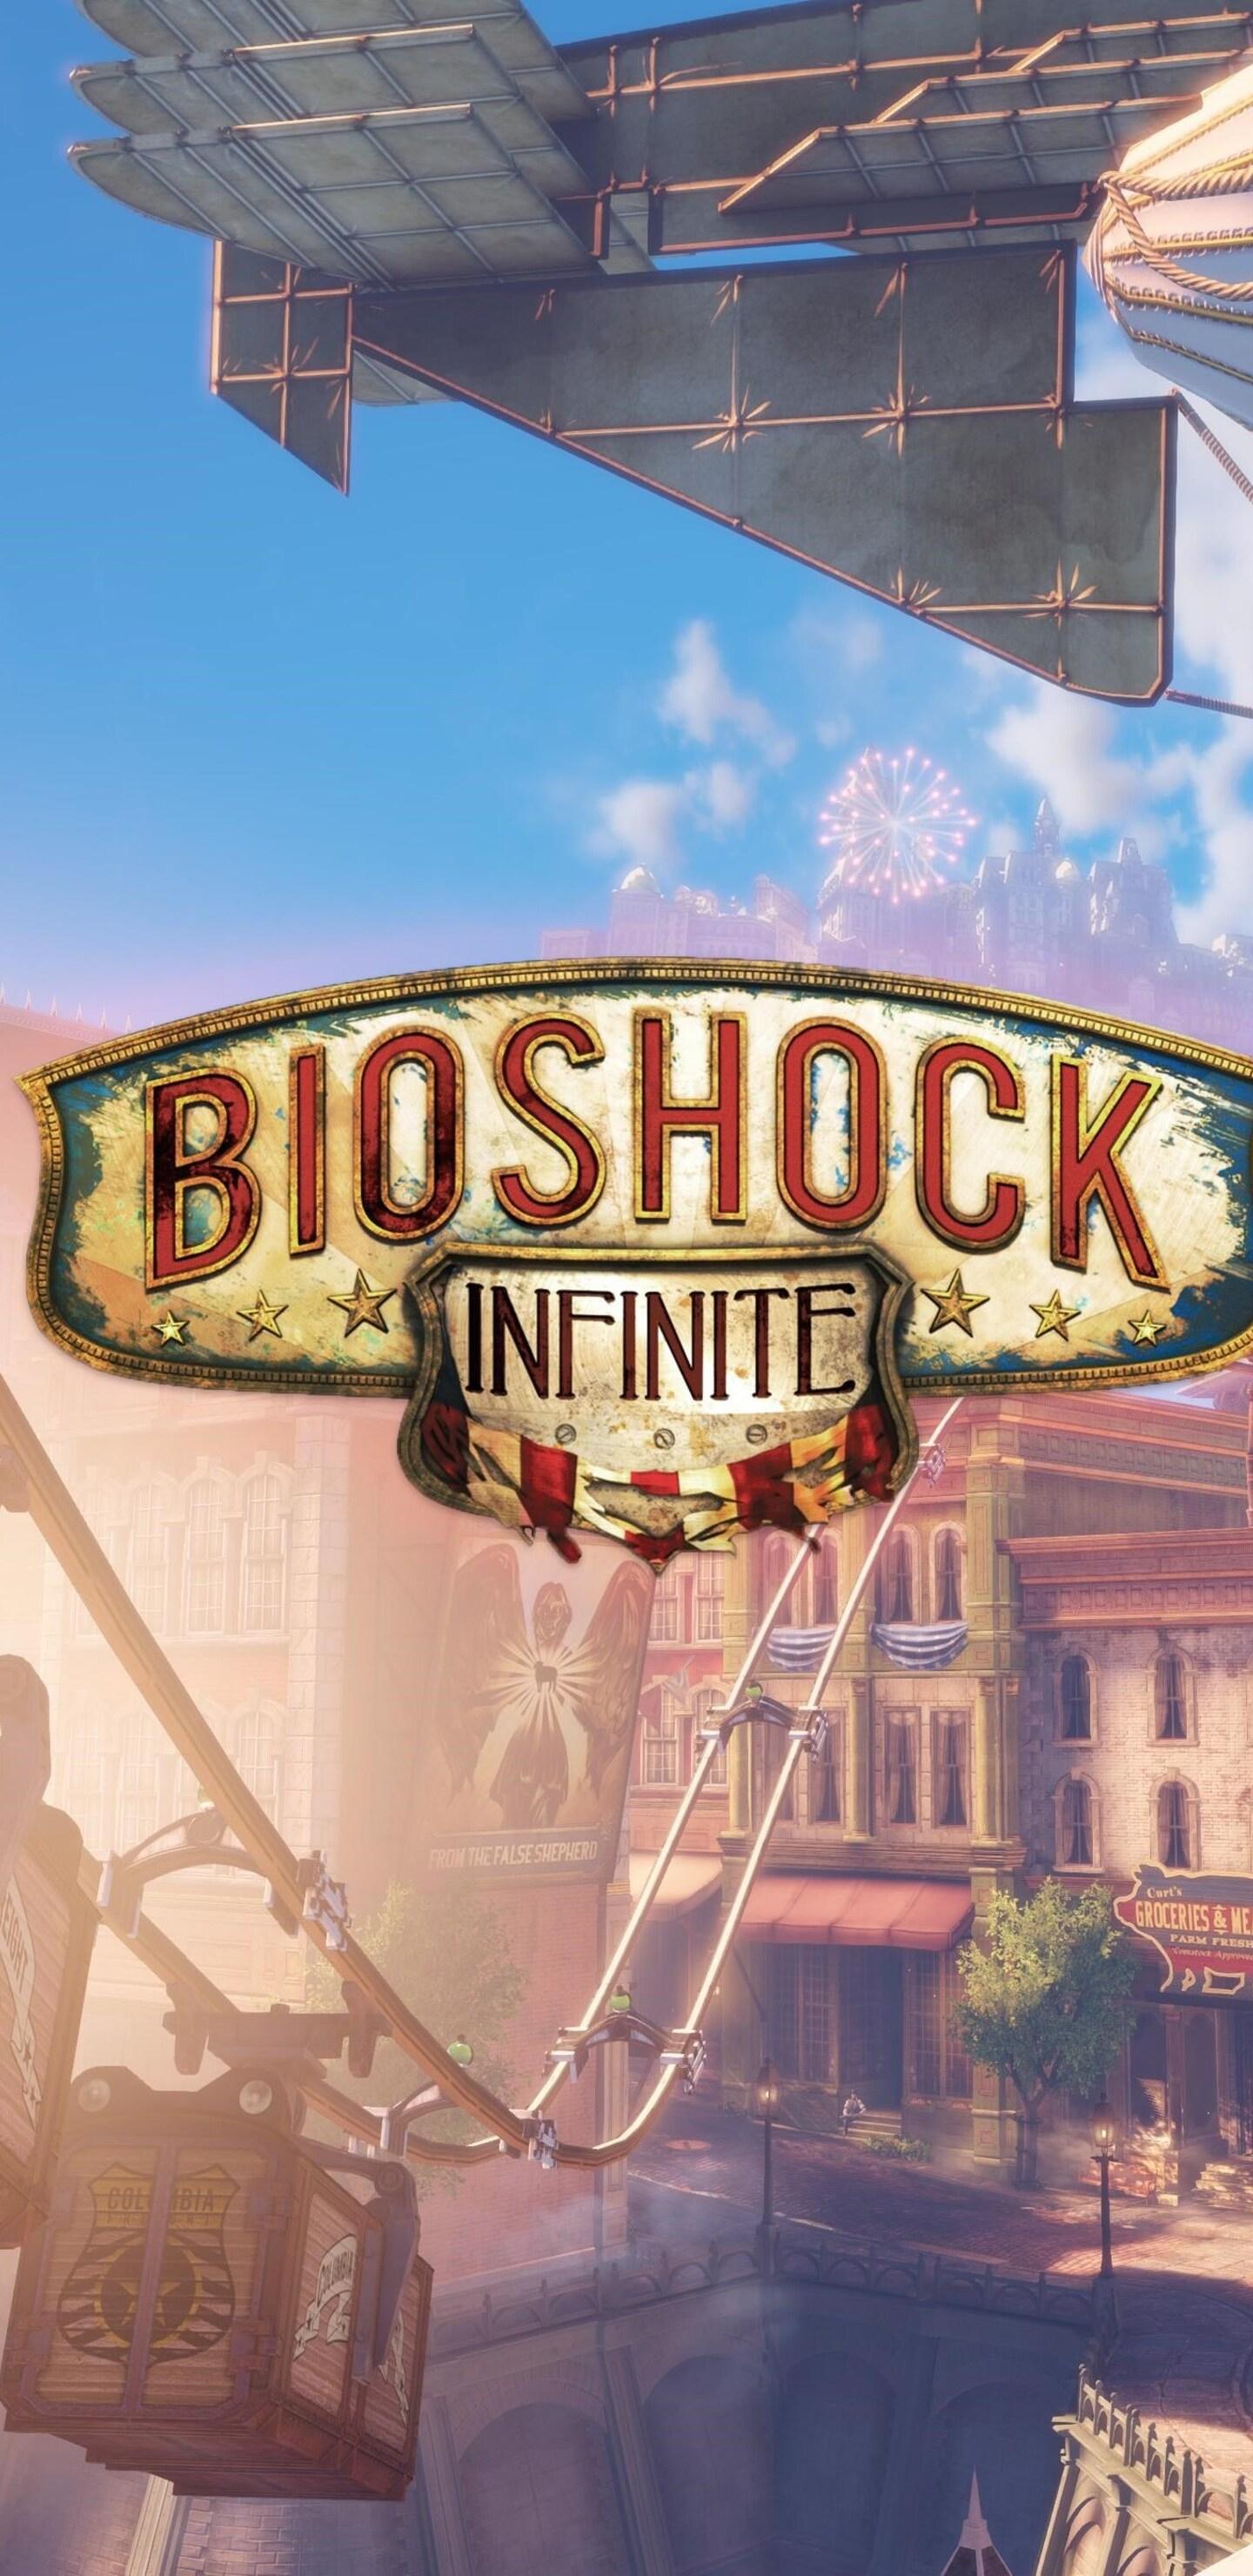 1440x2960 2016 Bioshock Infinite Samsung Galaxy S8S8 Note 8 QHD